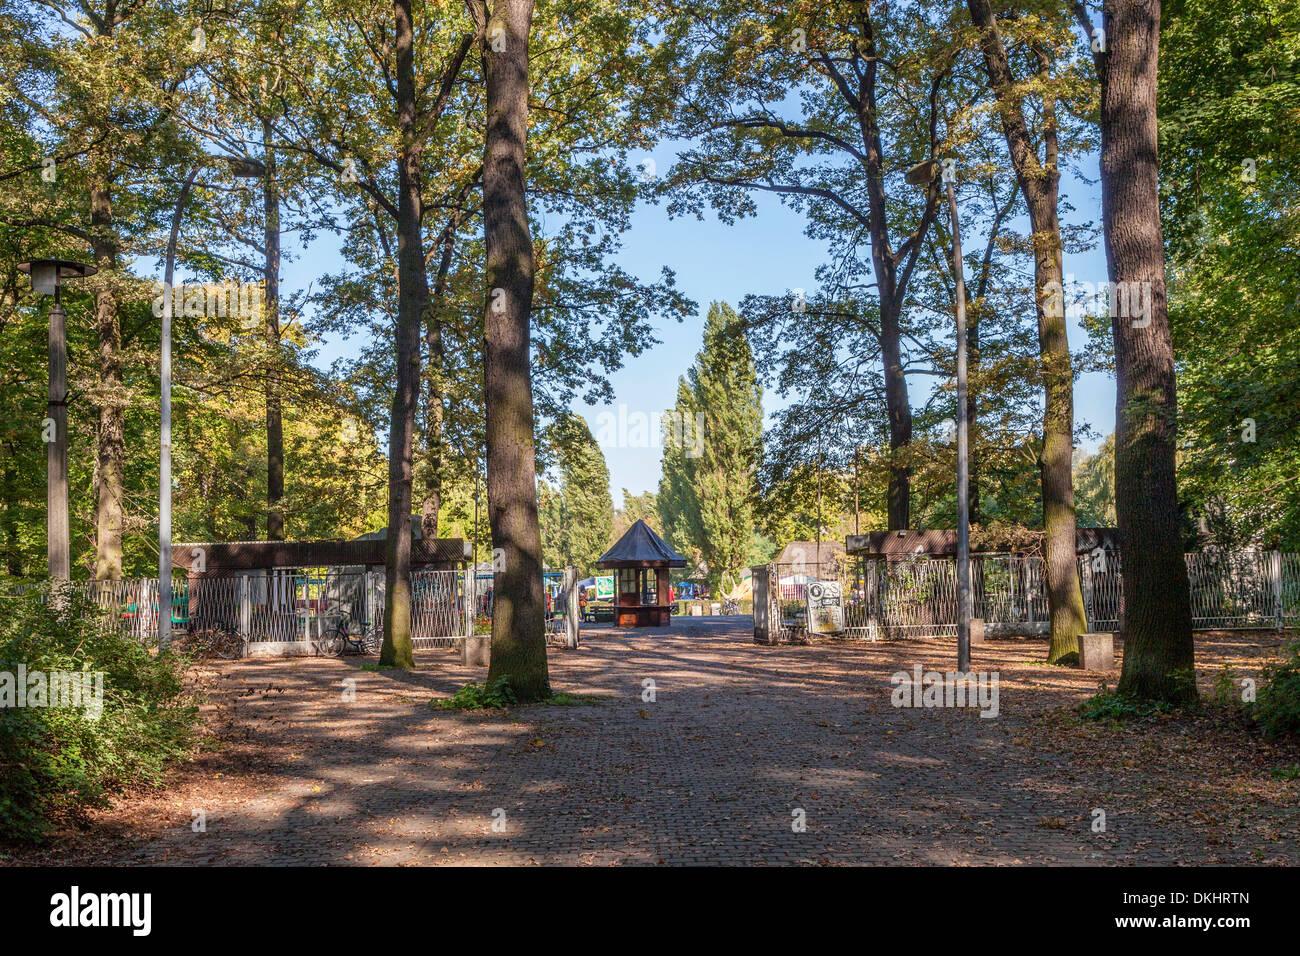 Amusement Park Entrance High Resolution Stock Photography And Images Alamy,Modern Long Narrow Bathroom Ideas